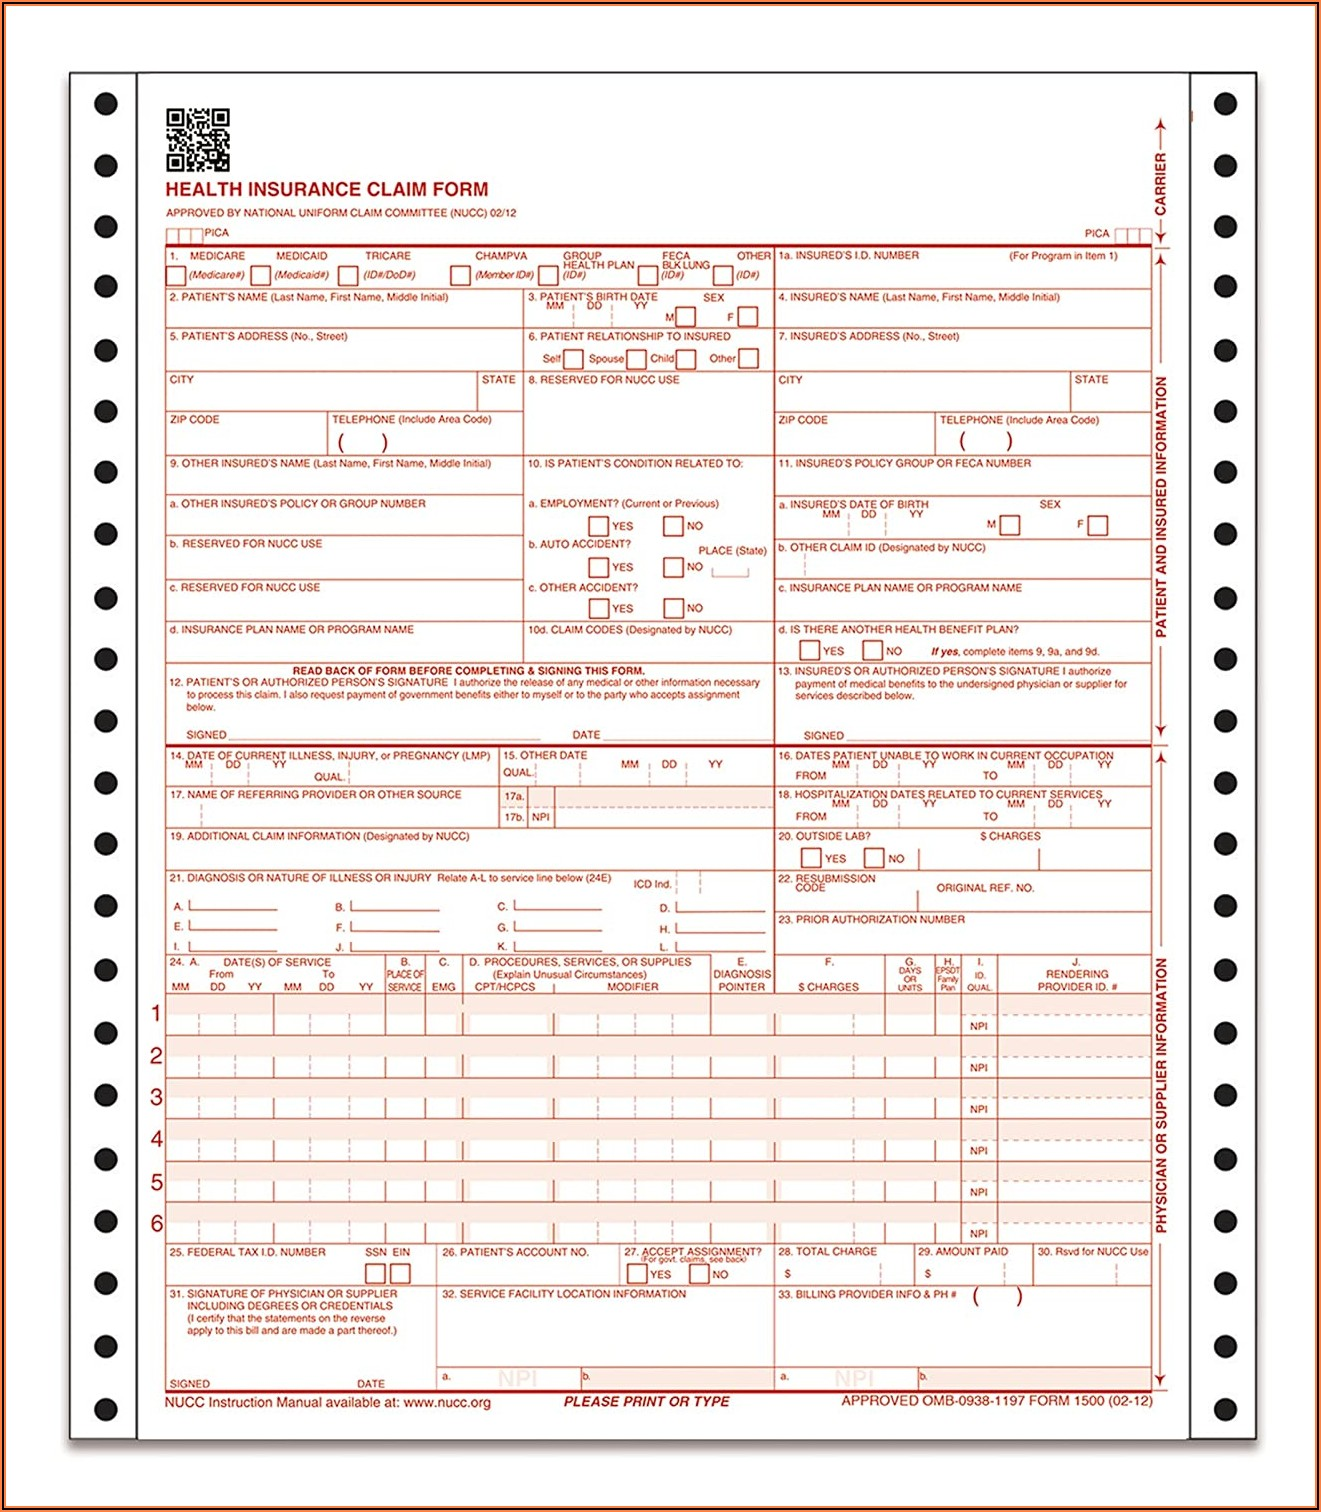 Cms 1500 Claim Forms